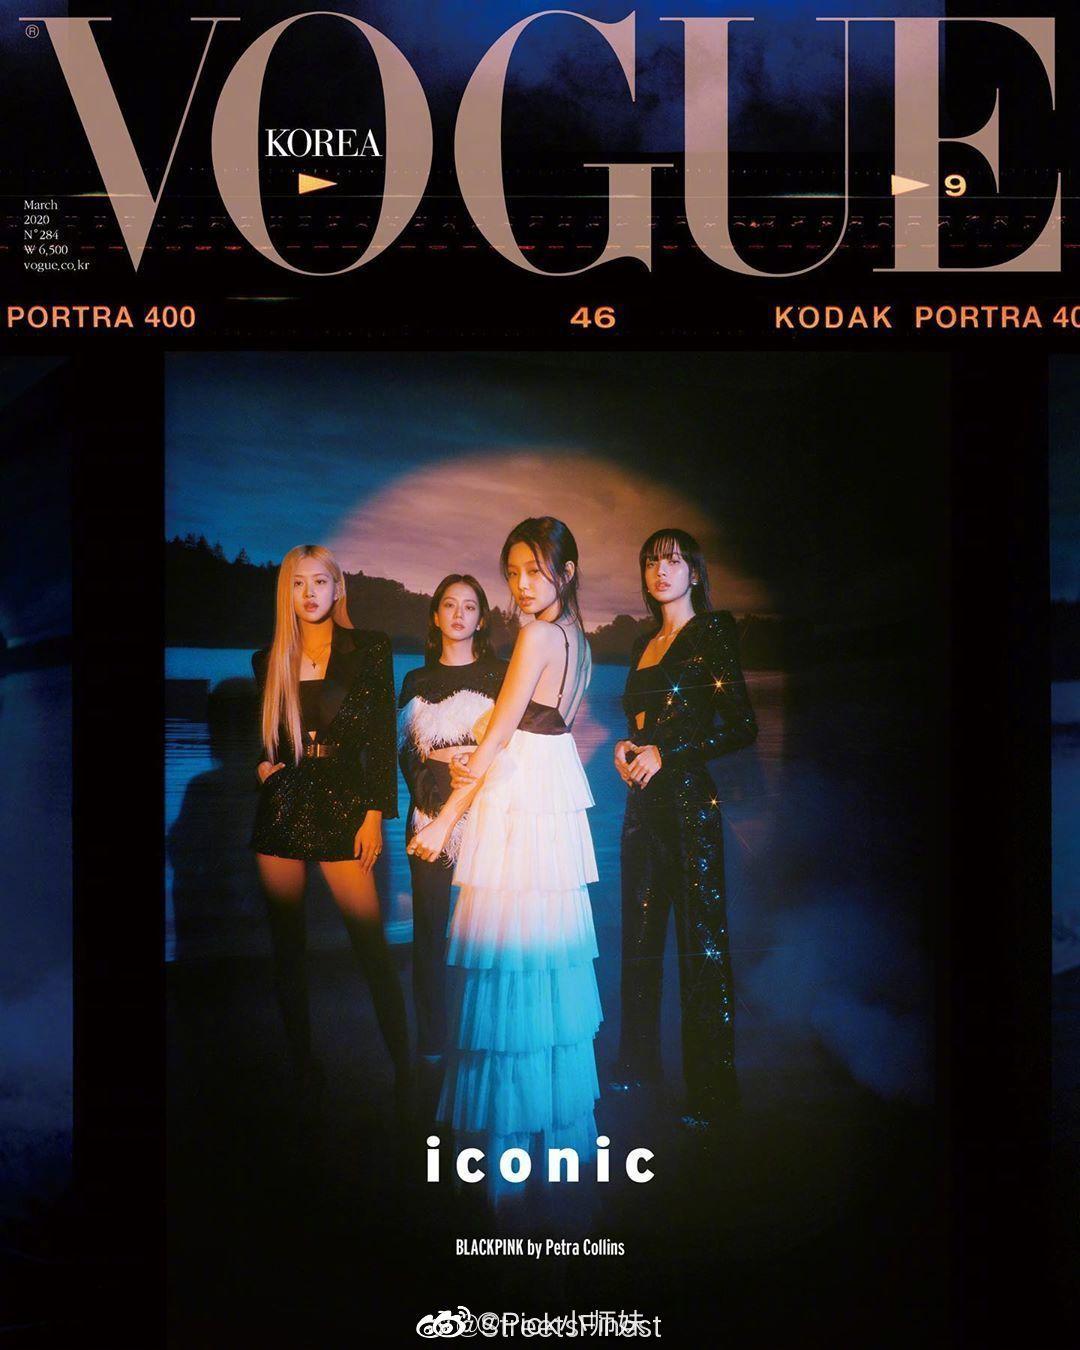 BLACKPINK×《VOGUE》韩版三月刊,首个登上《VOGUE》的女团